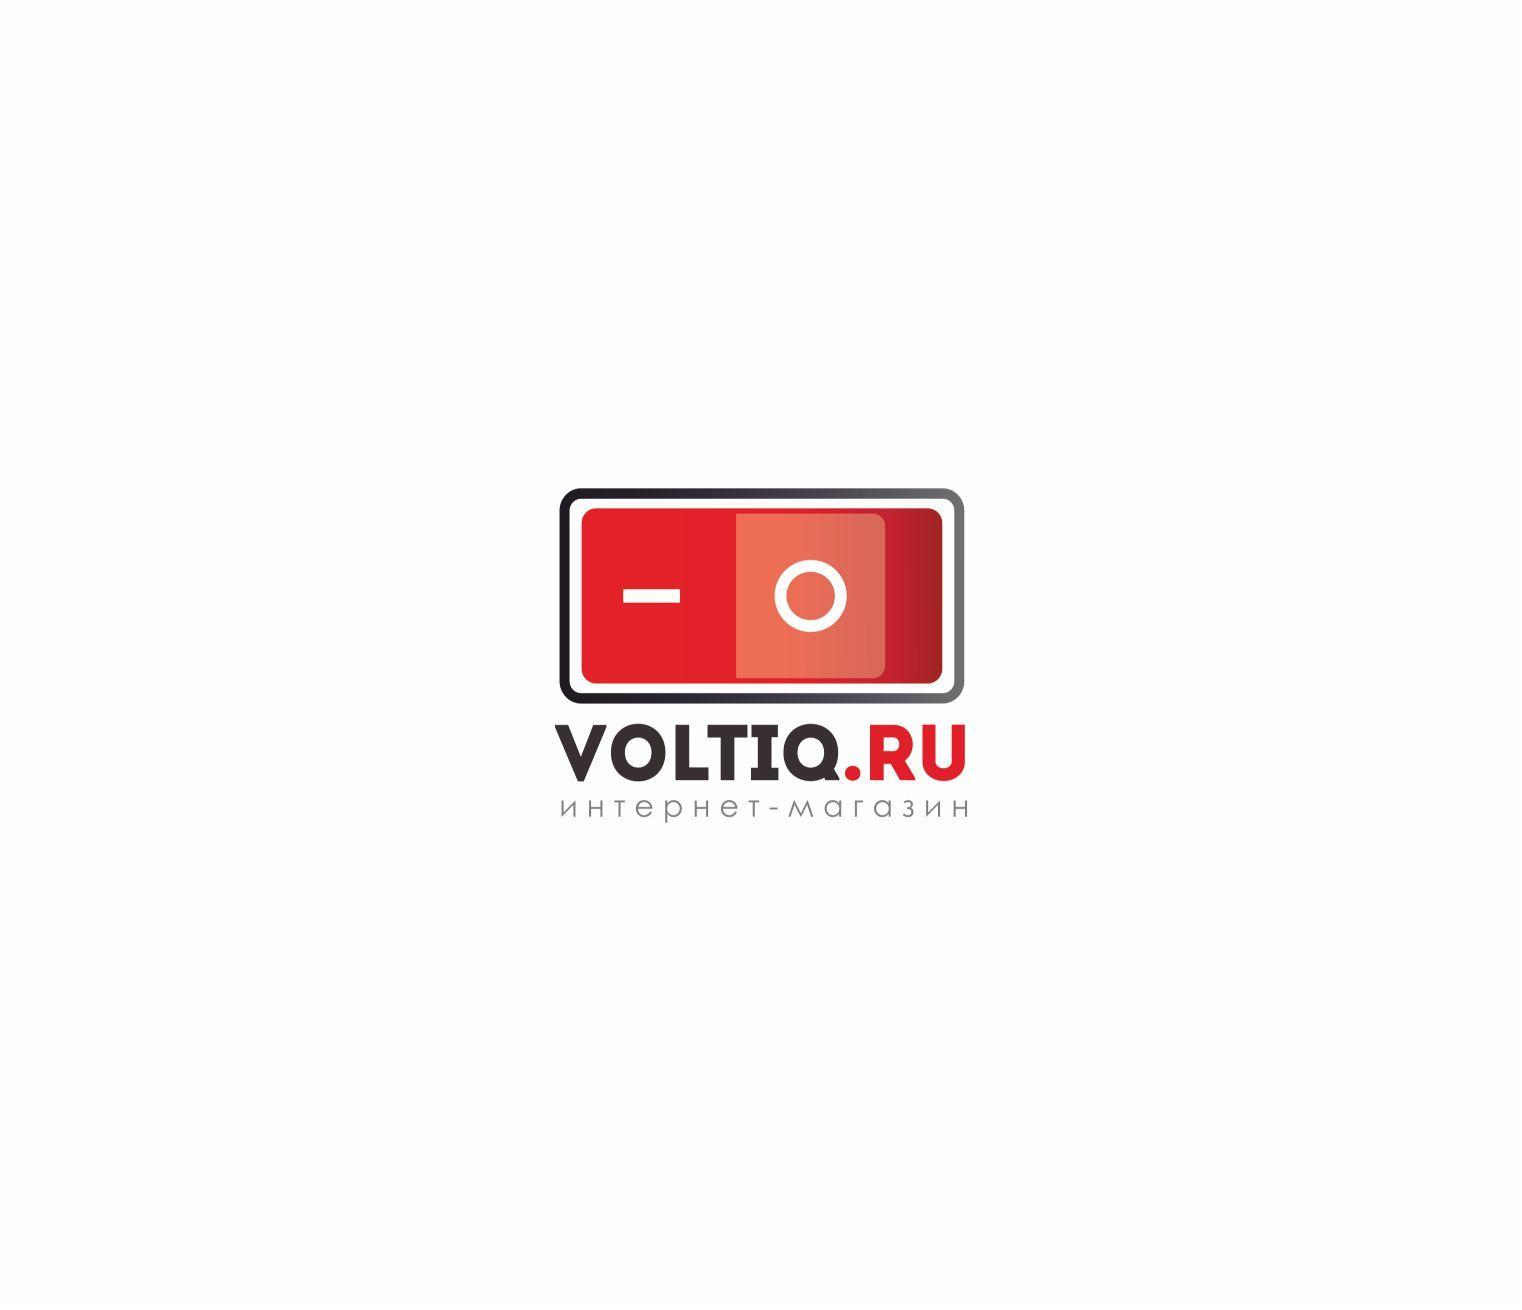 Логотип для Интернет-магазин Вольтик (VoltIQ.ru) - дизайнер Katarinka